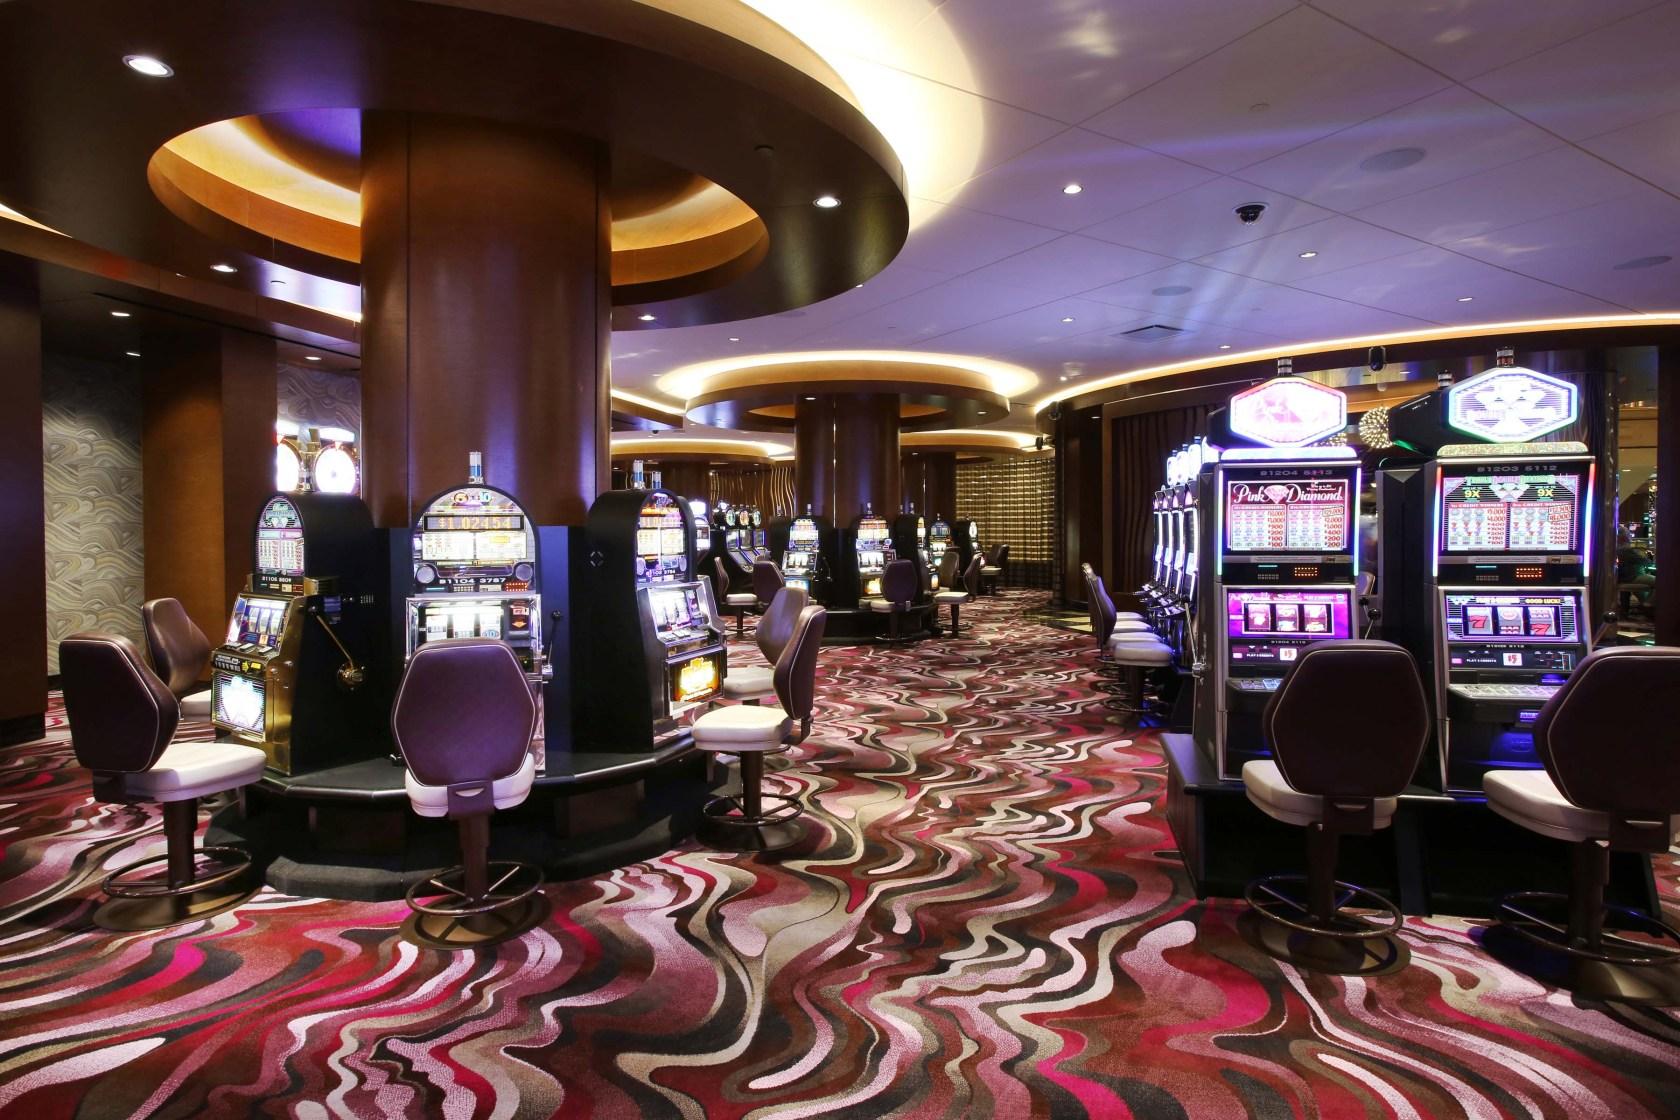 Tropicana High-limit Slot Room - Architizer